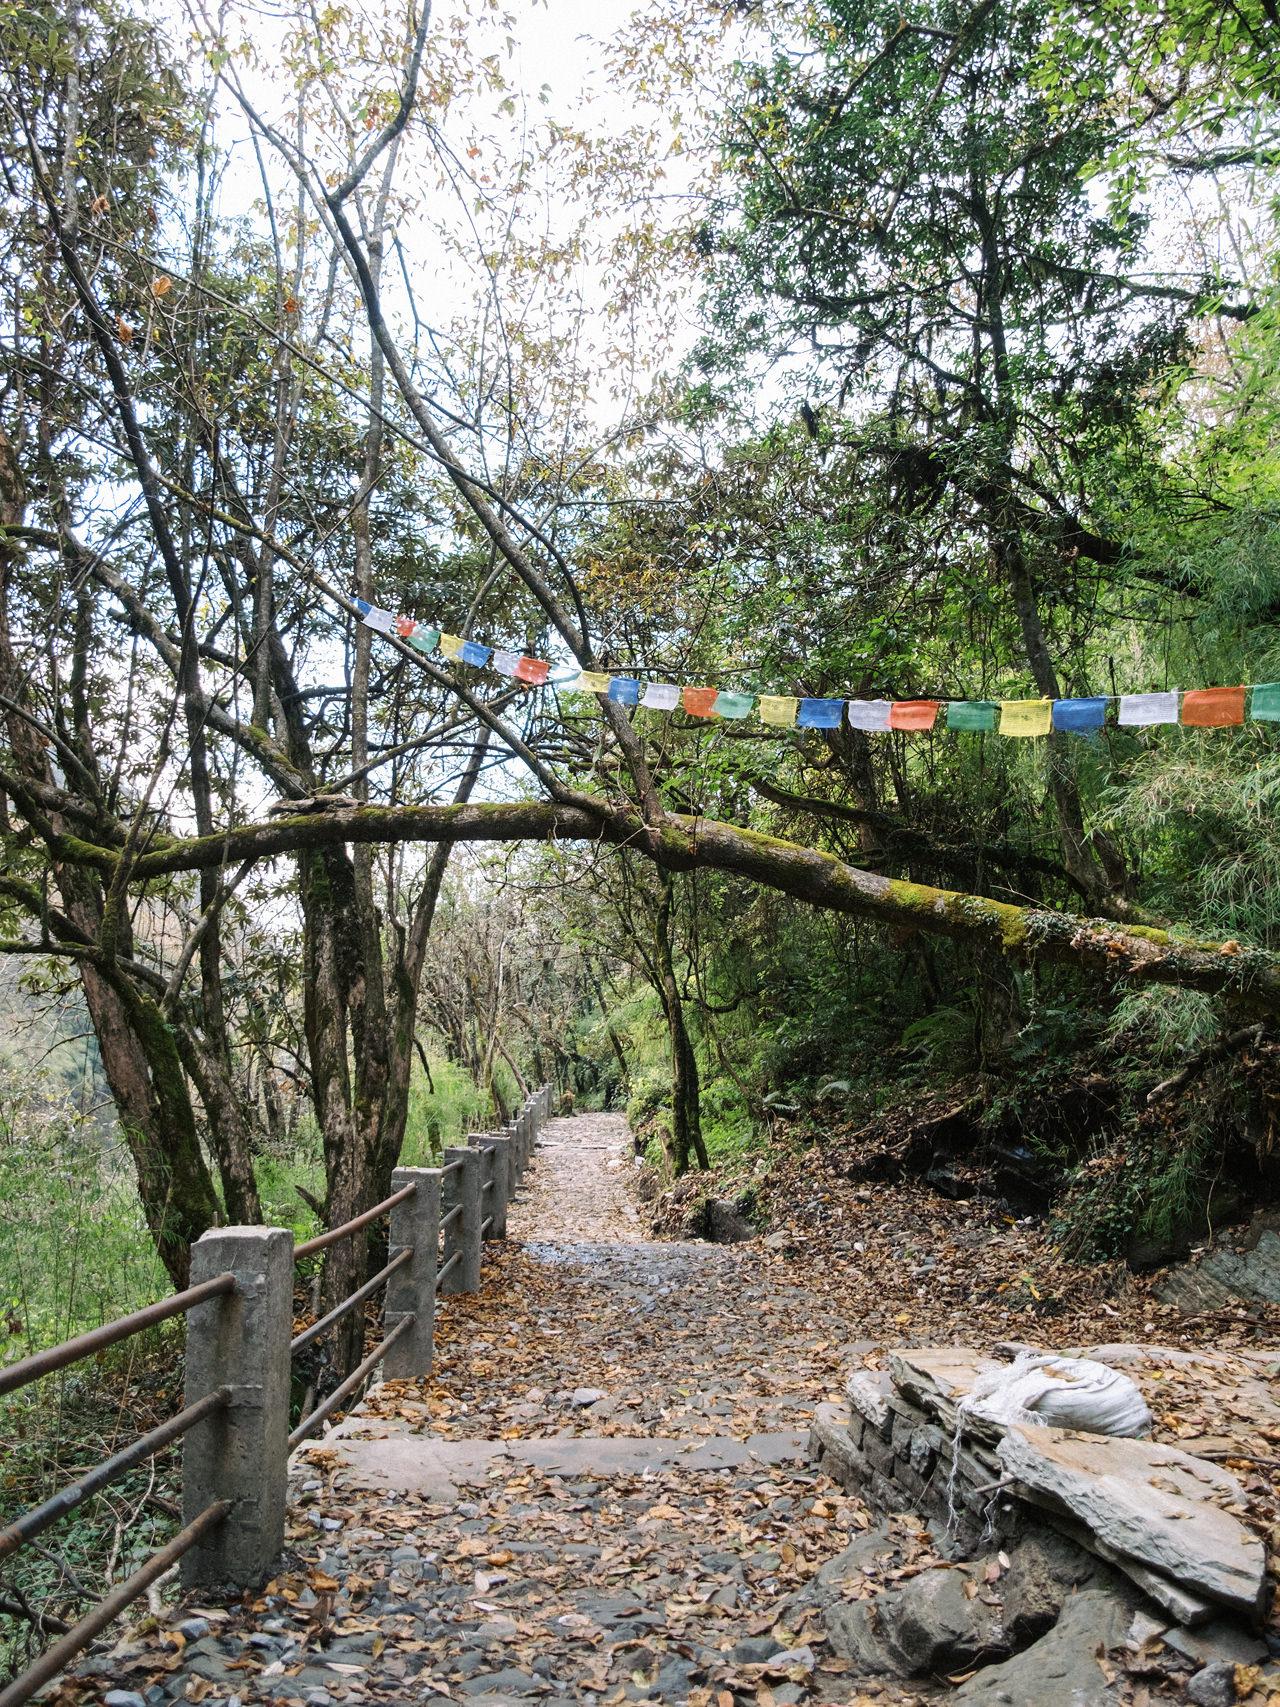 Nepal 2019 - Trekking Annapurna Base Camp 102